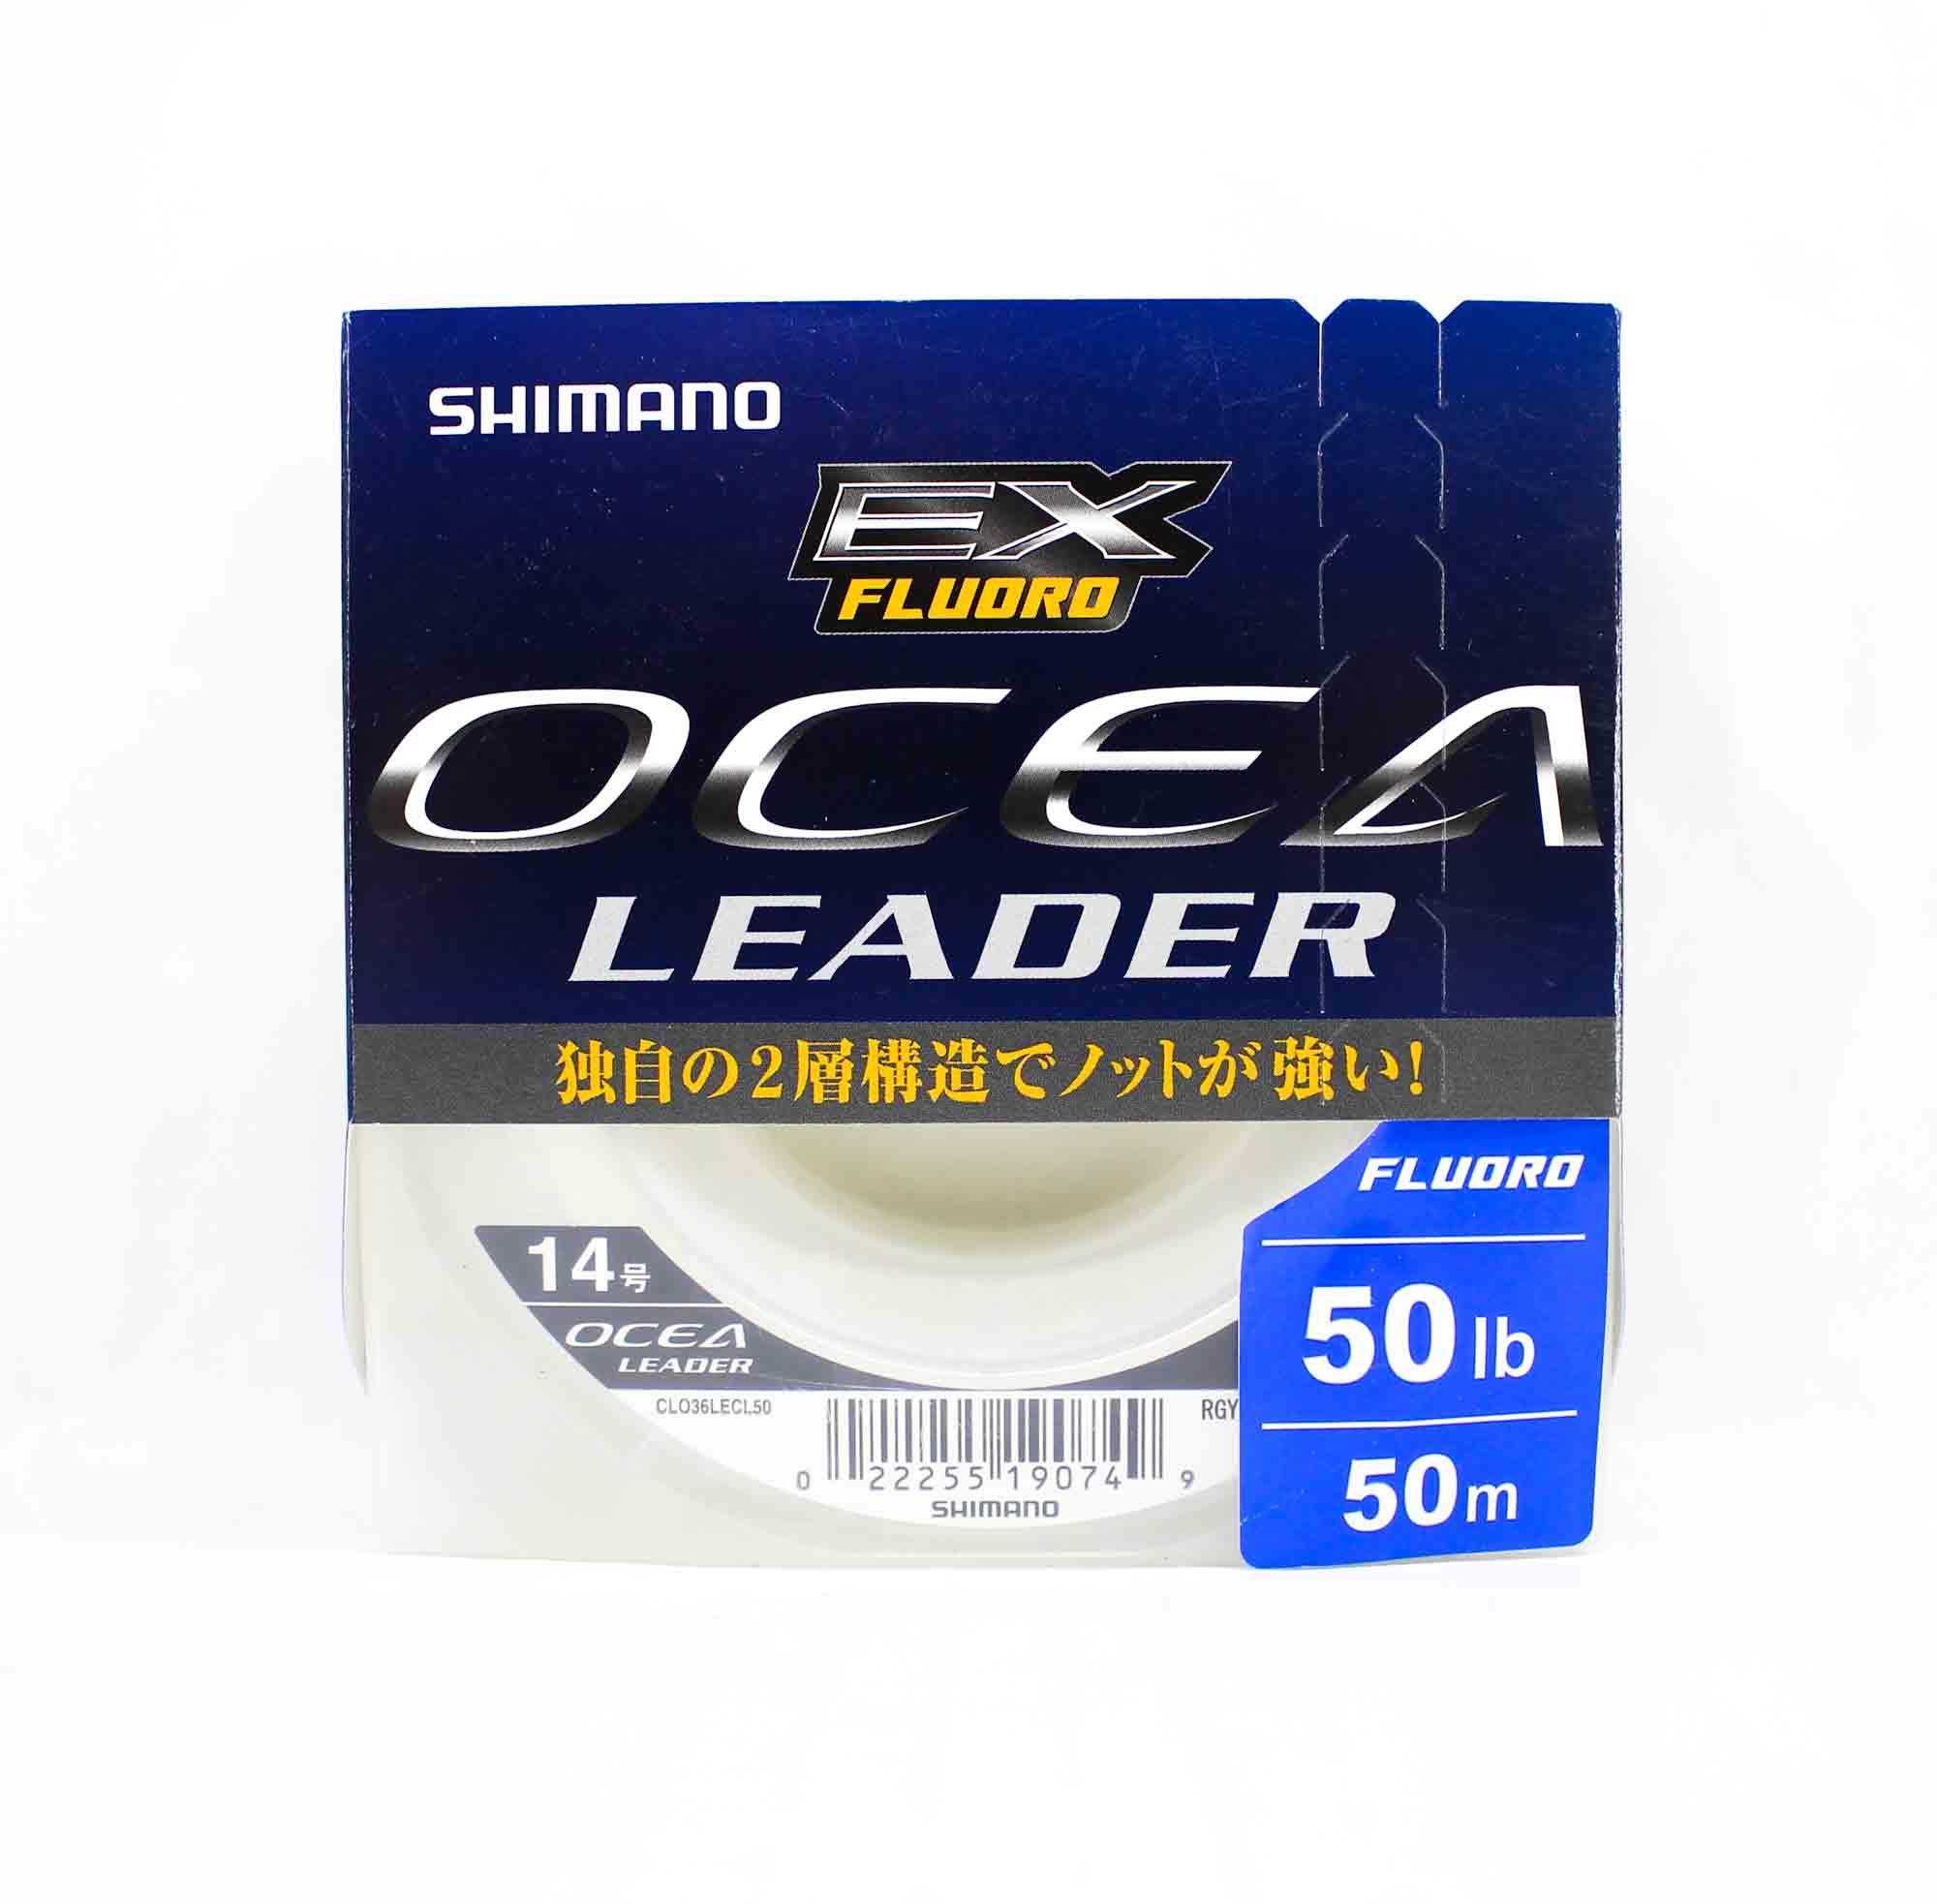 Shimano CL-036L Ocea EX Fluorocarbon Leader Line 50m 50lb (0749)